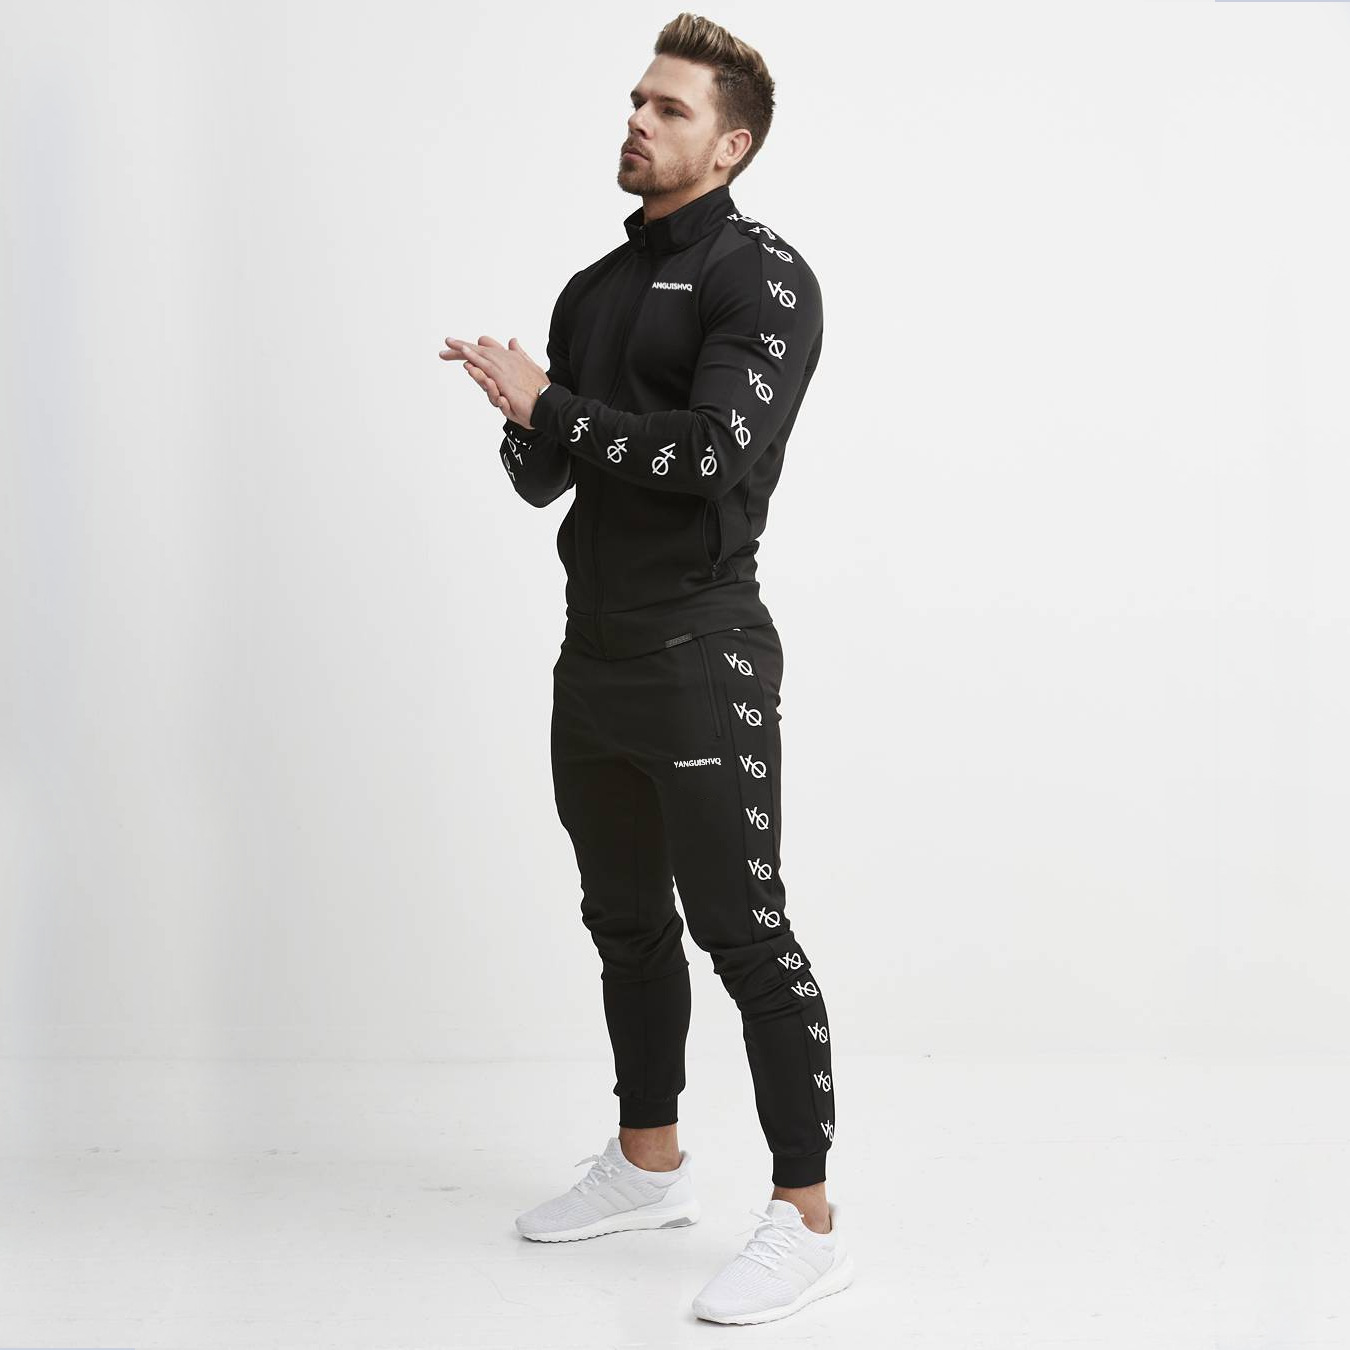 Autumn And Winter Men's Suit New Casual Sportswear Fitness Jogger 2-piece Hip Hop Brand Men's Suit Vanquish Mens Fashion 2019